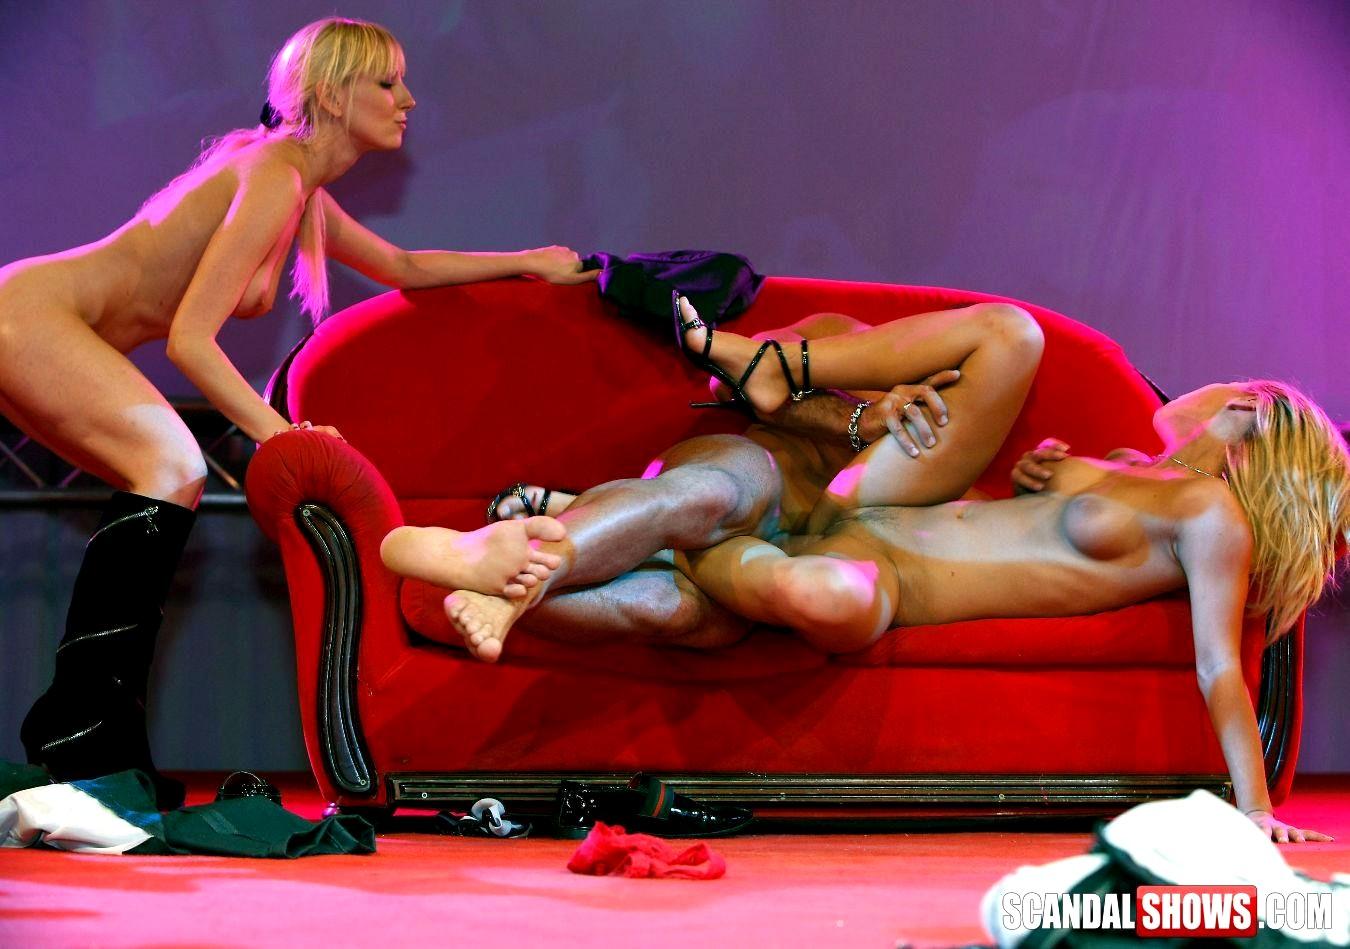 Sex Live Tv Women On Cam